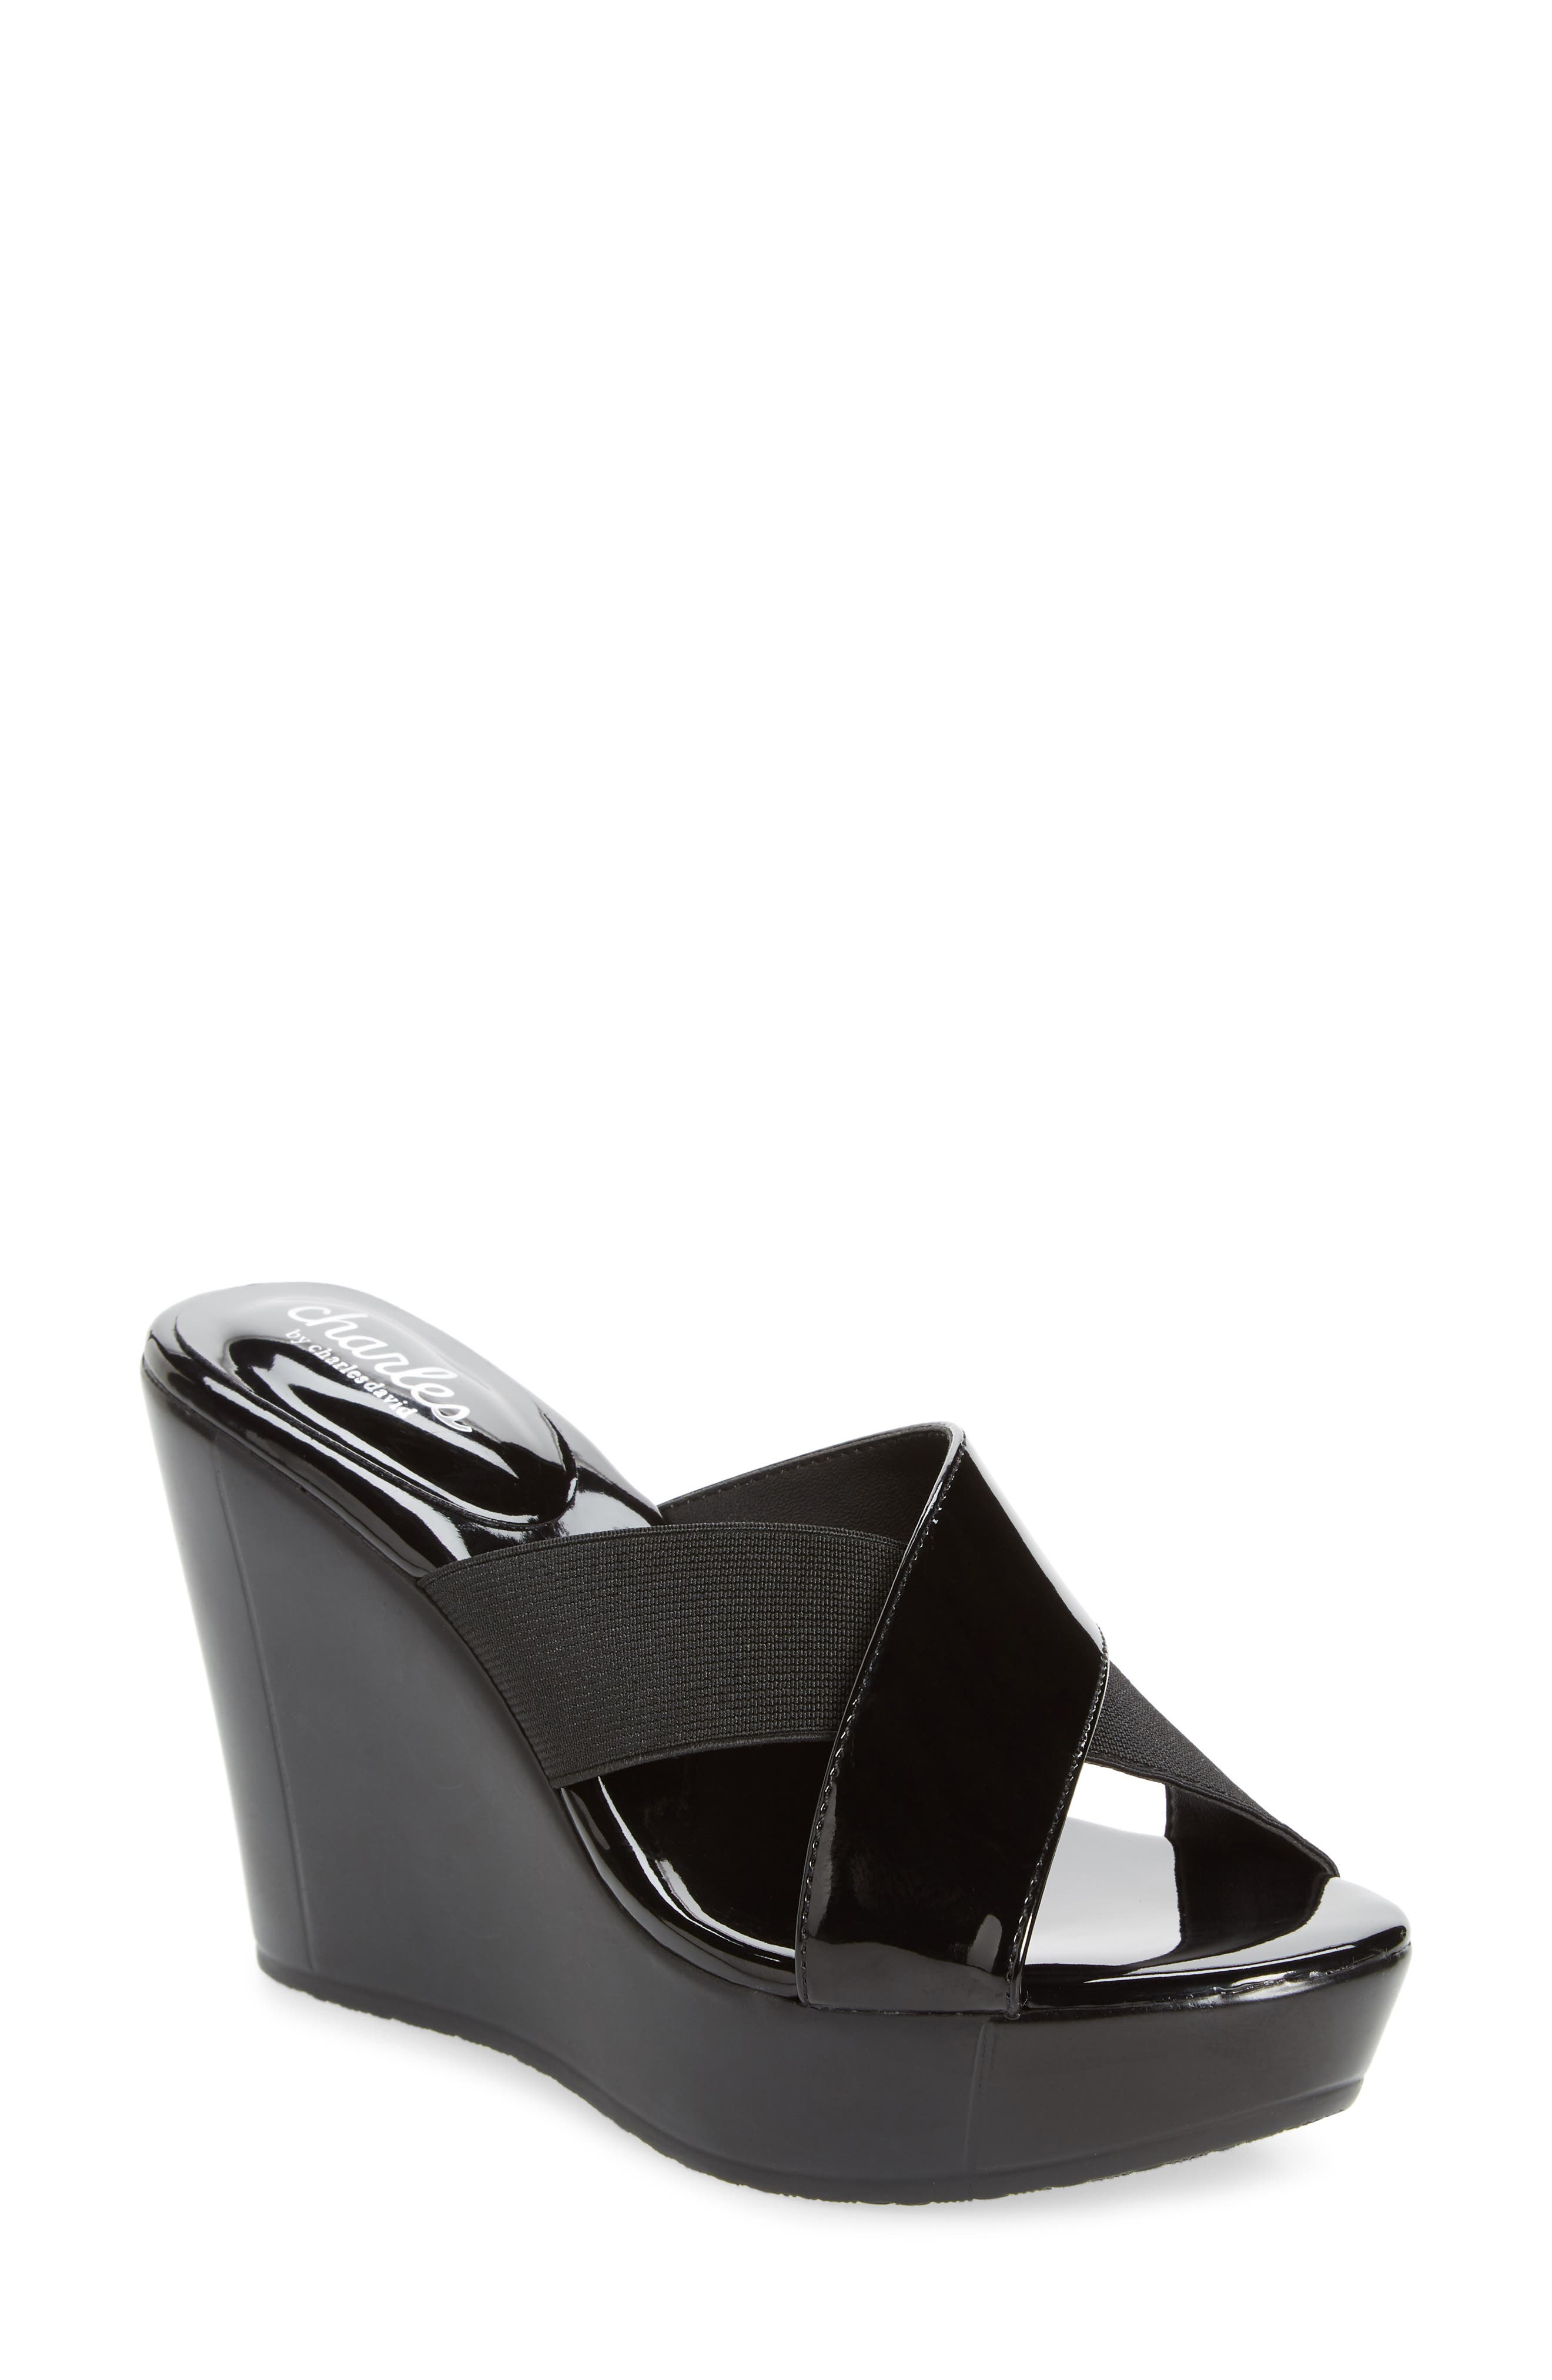 Charles By Charles David Fuzho Platform Wedge Sandal- Black